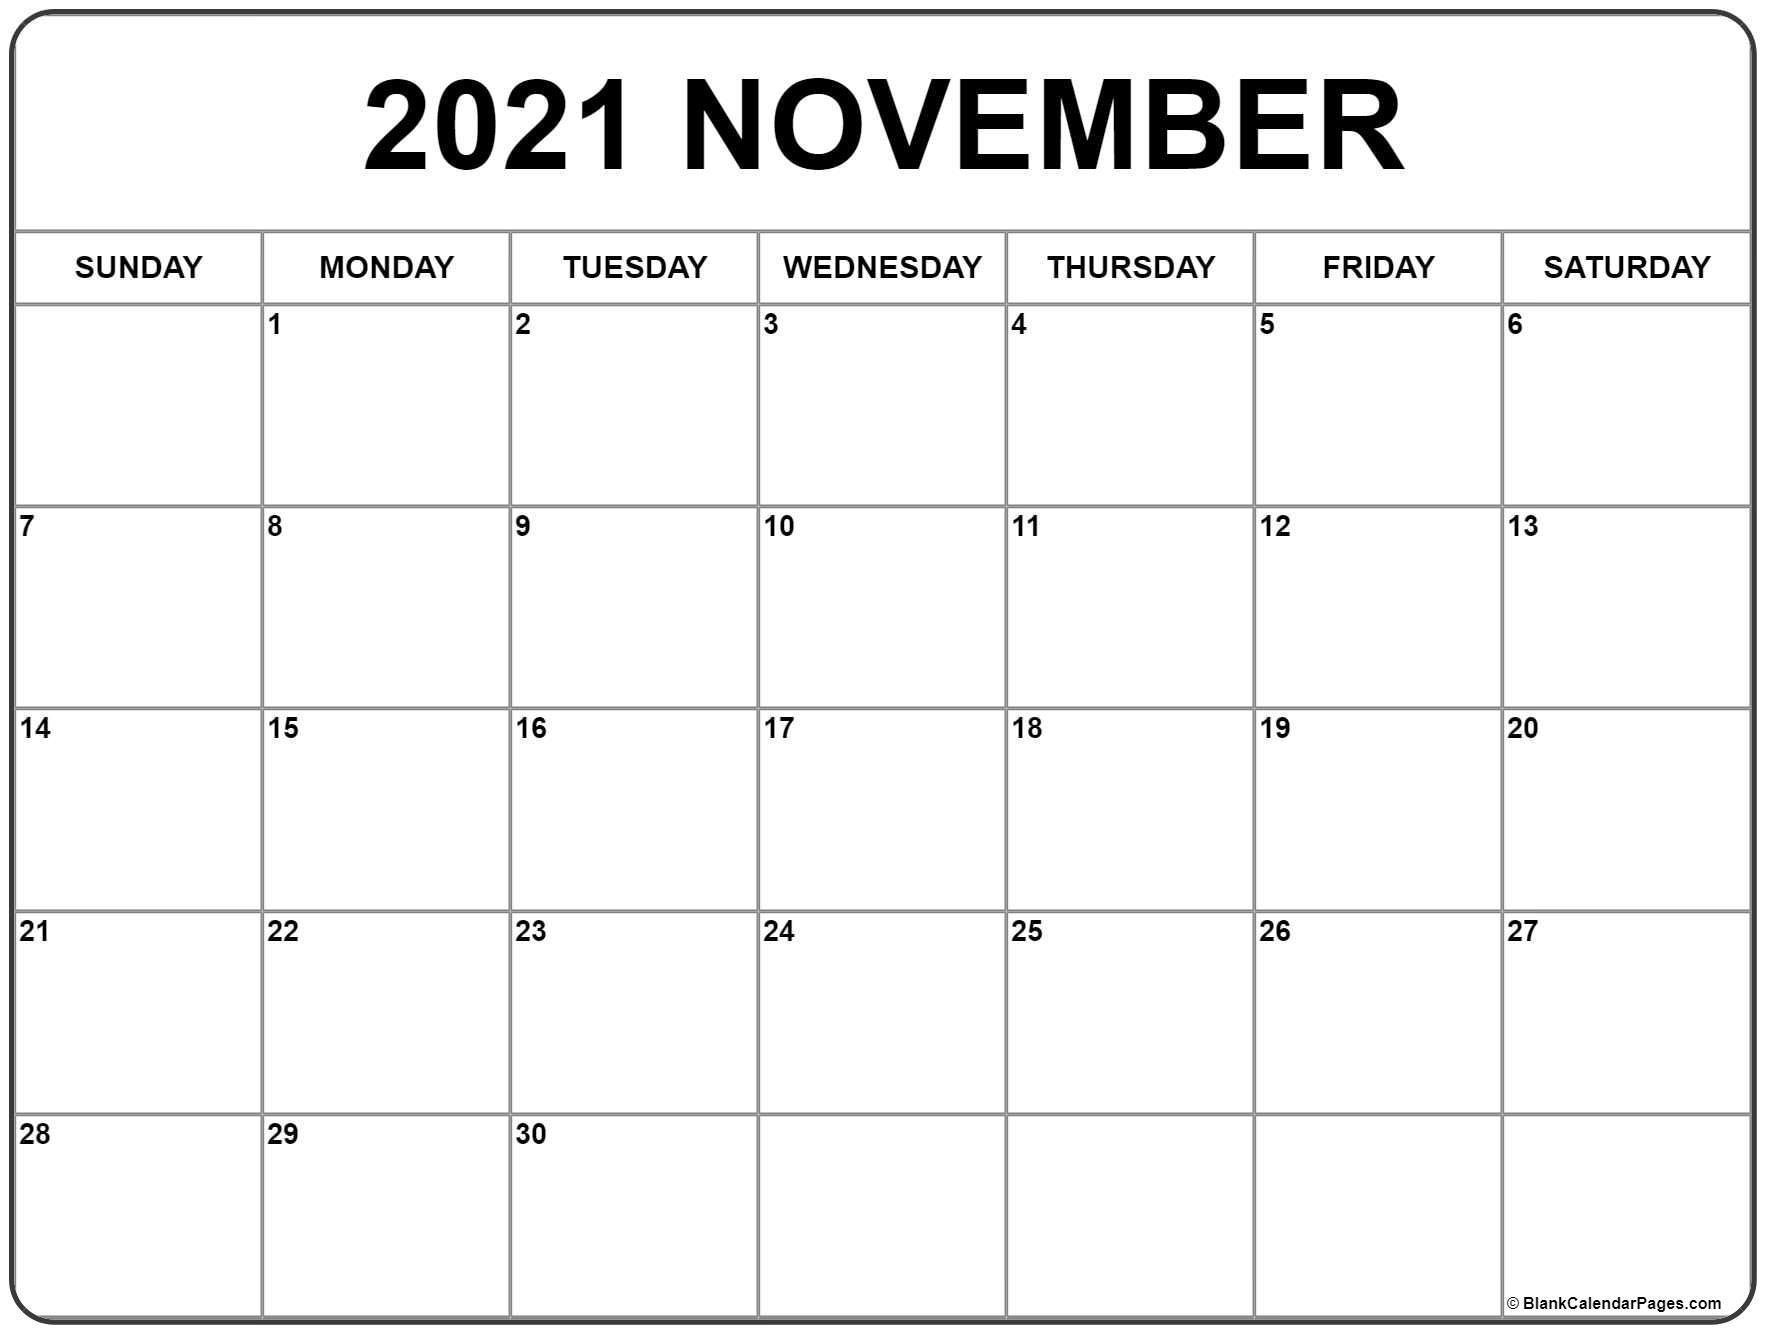 Take Print Free November 2021 Calendar Without Downloading